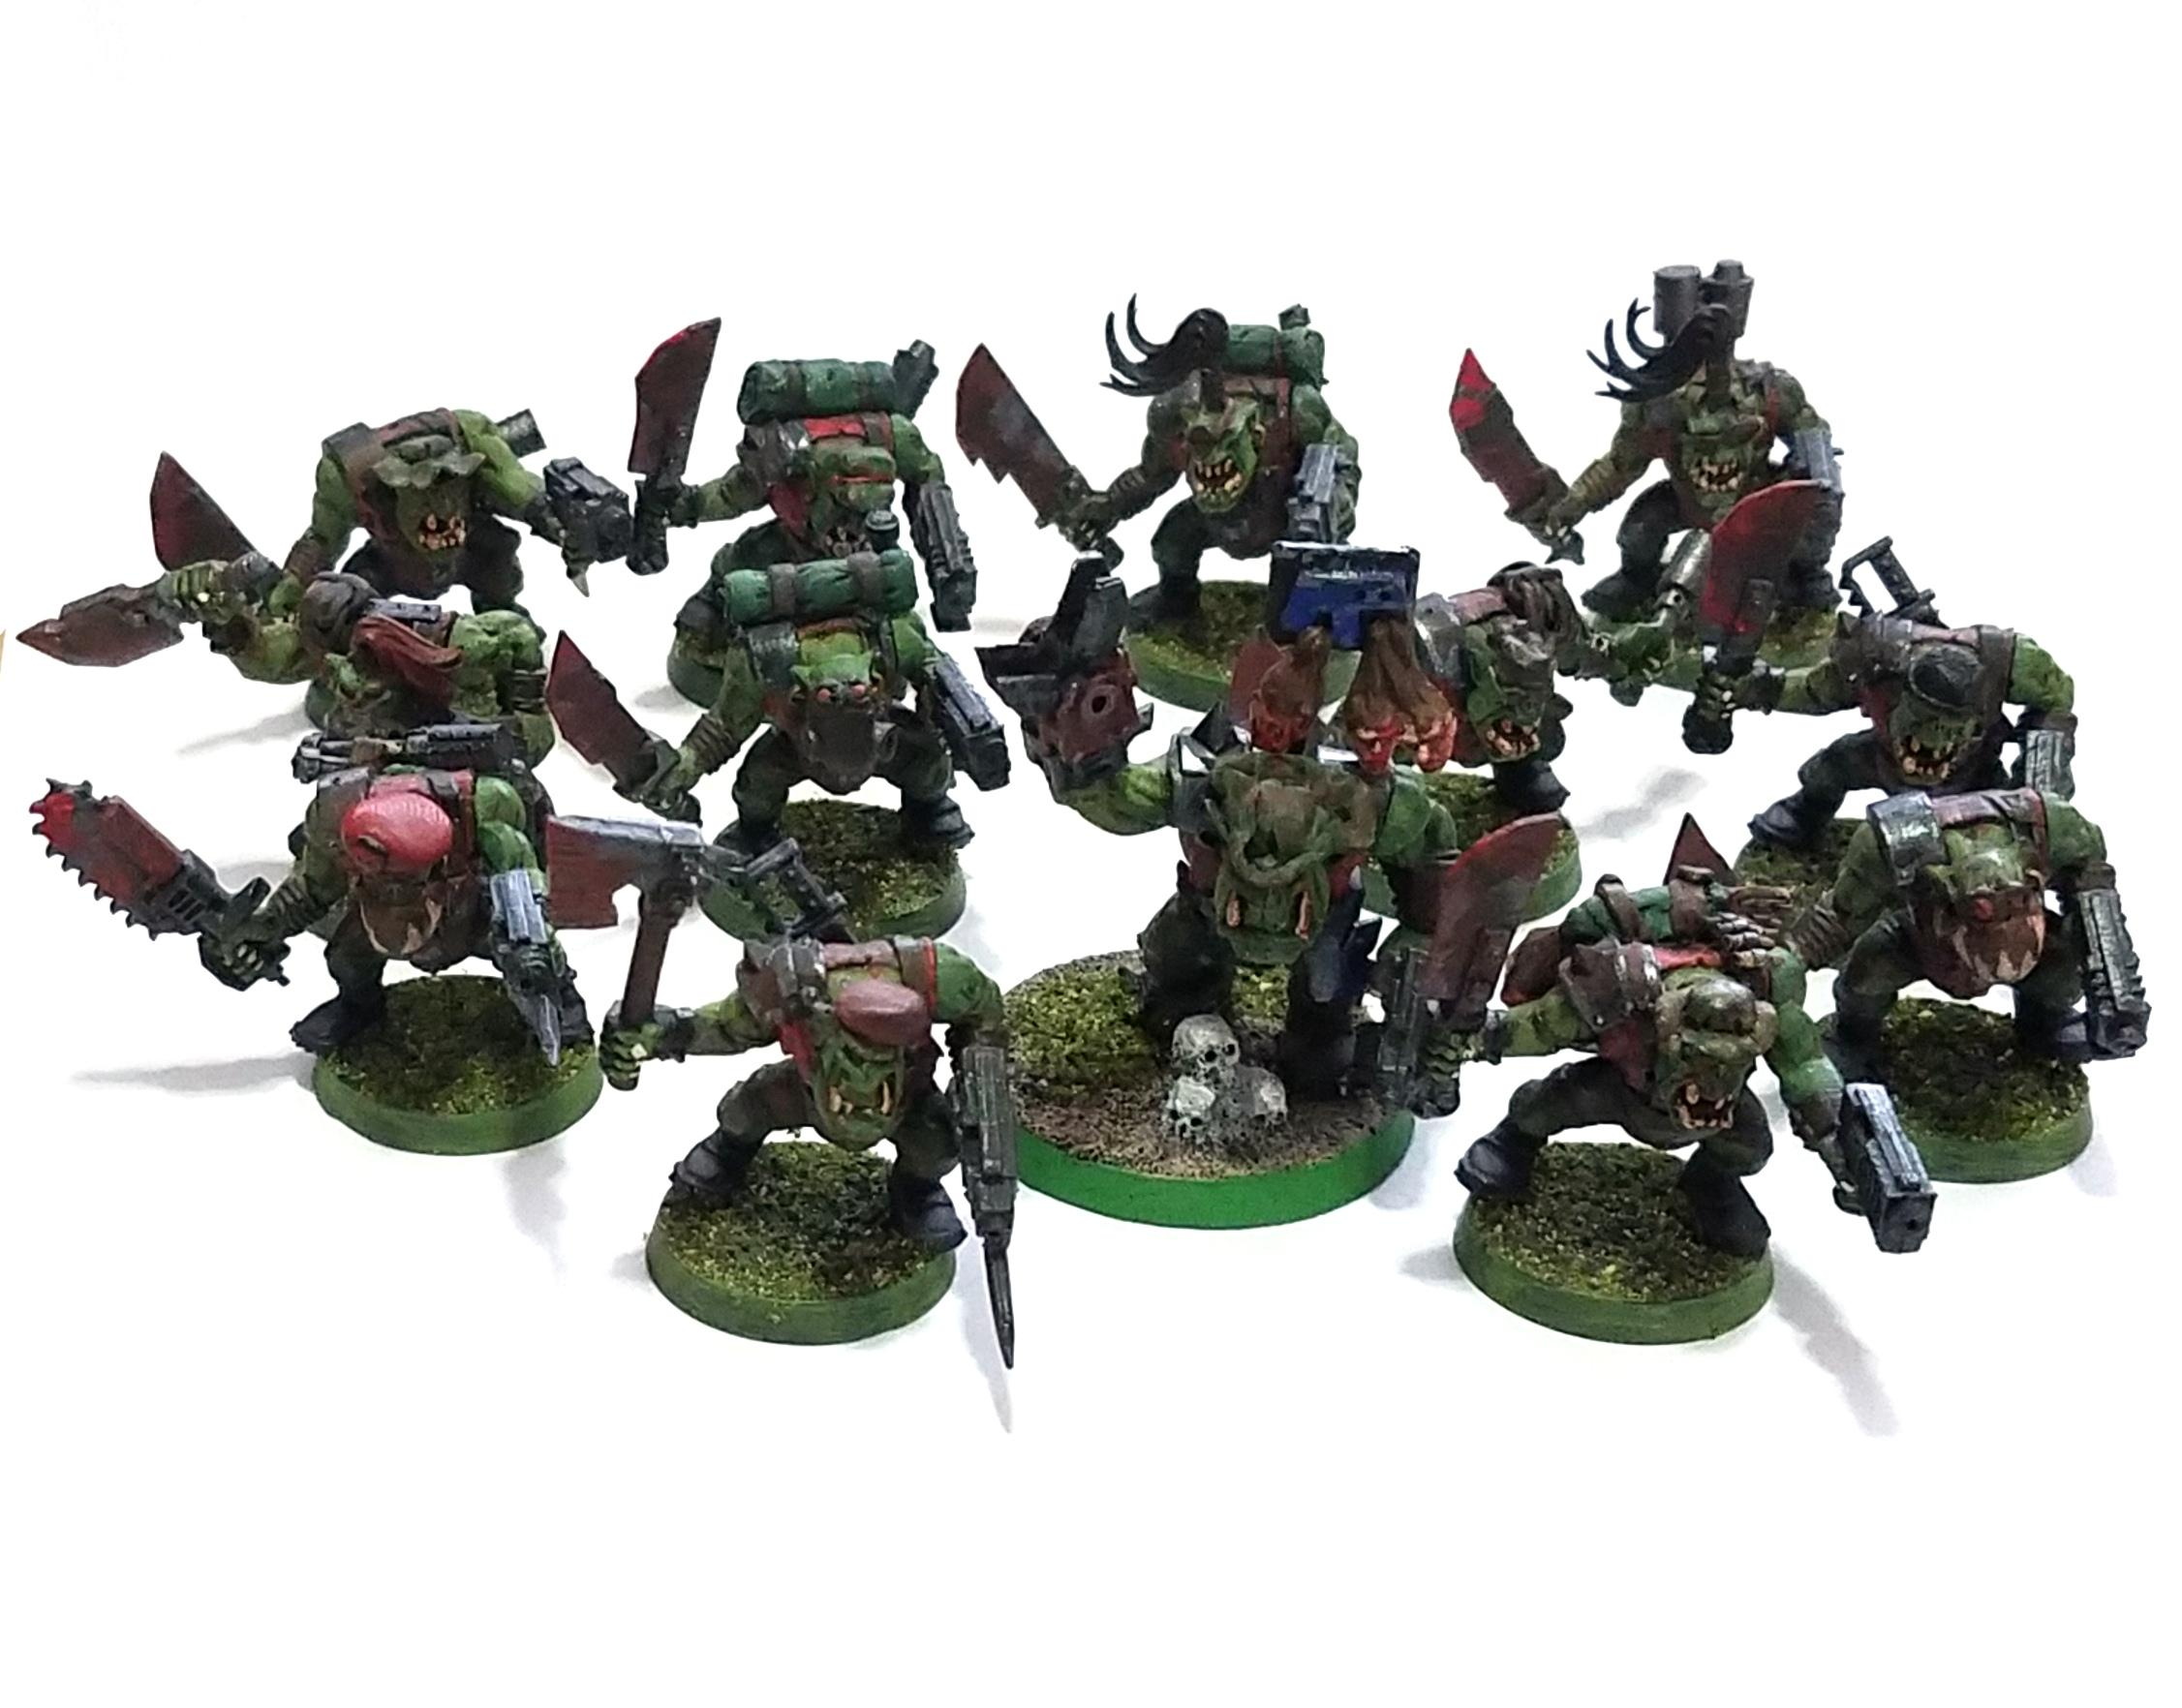 Blood Axe, Kommando, Mob, Nob, Power Klaw, Space Ork, Unit, Waaagh!